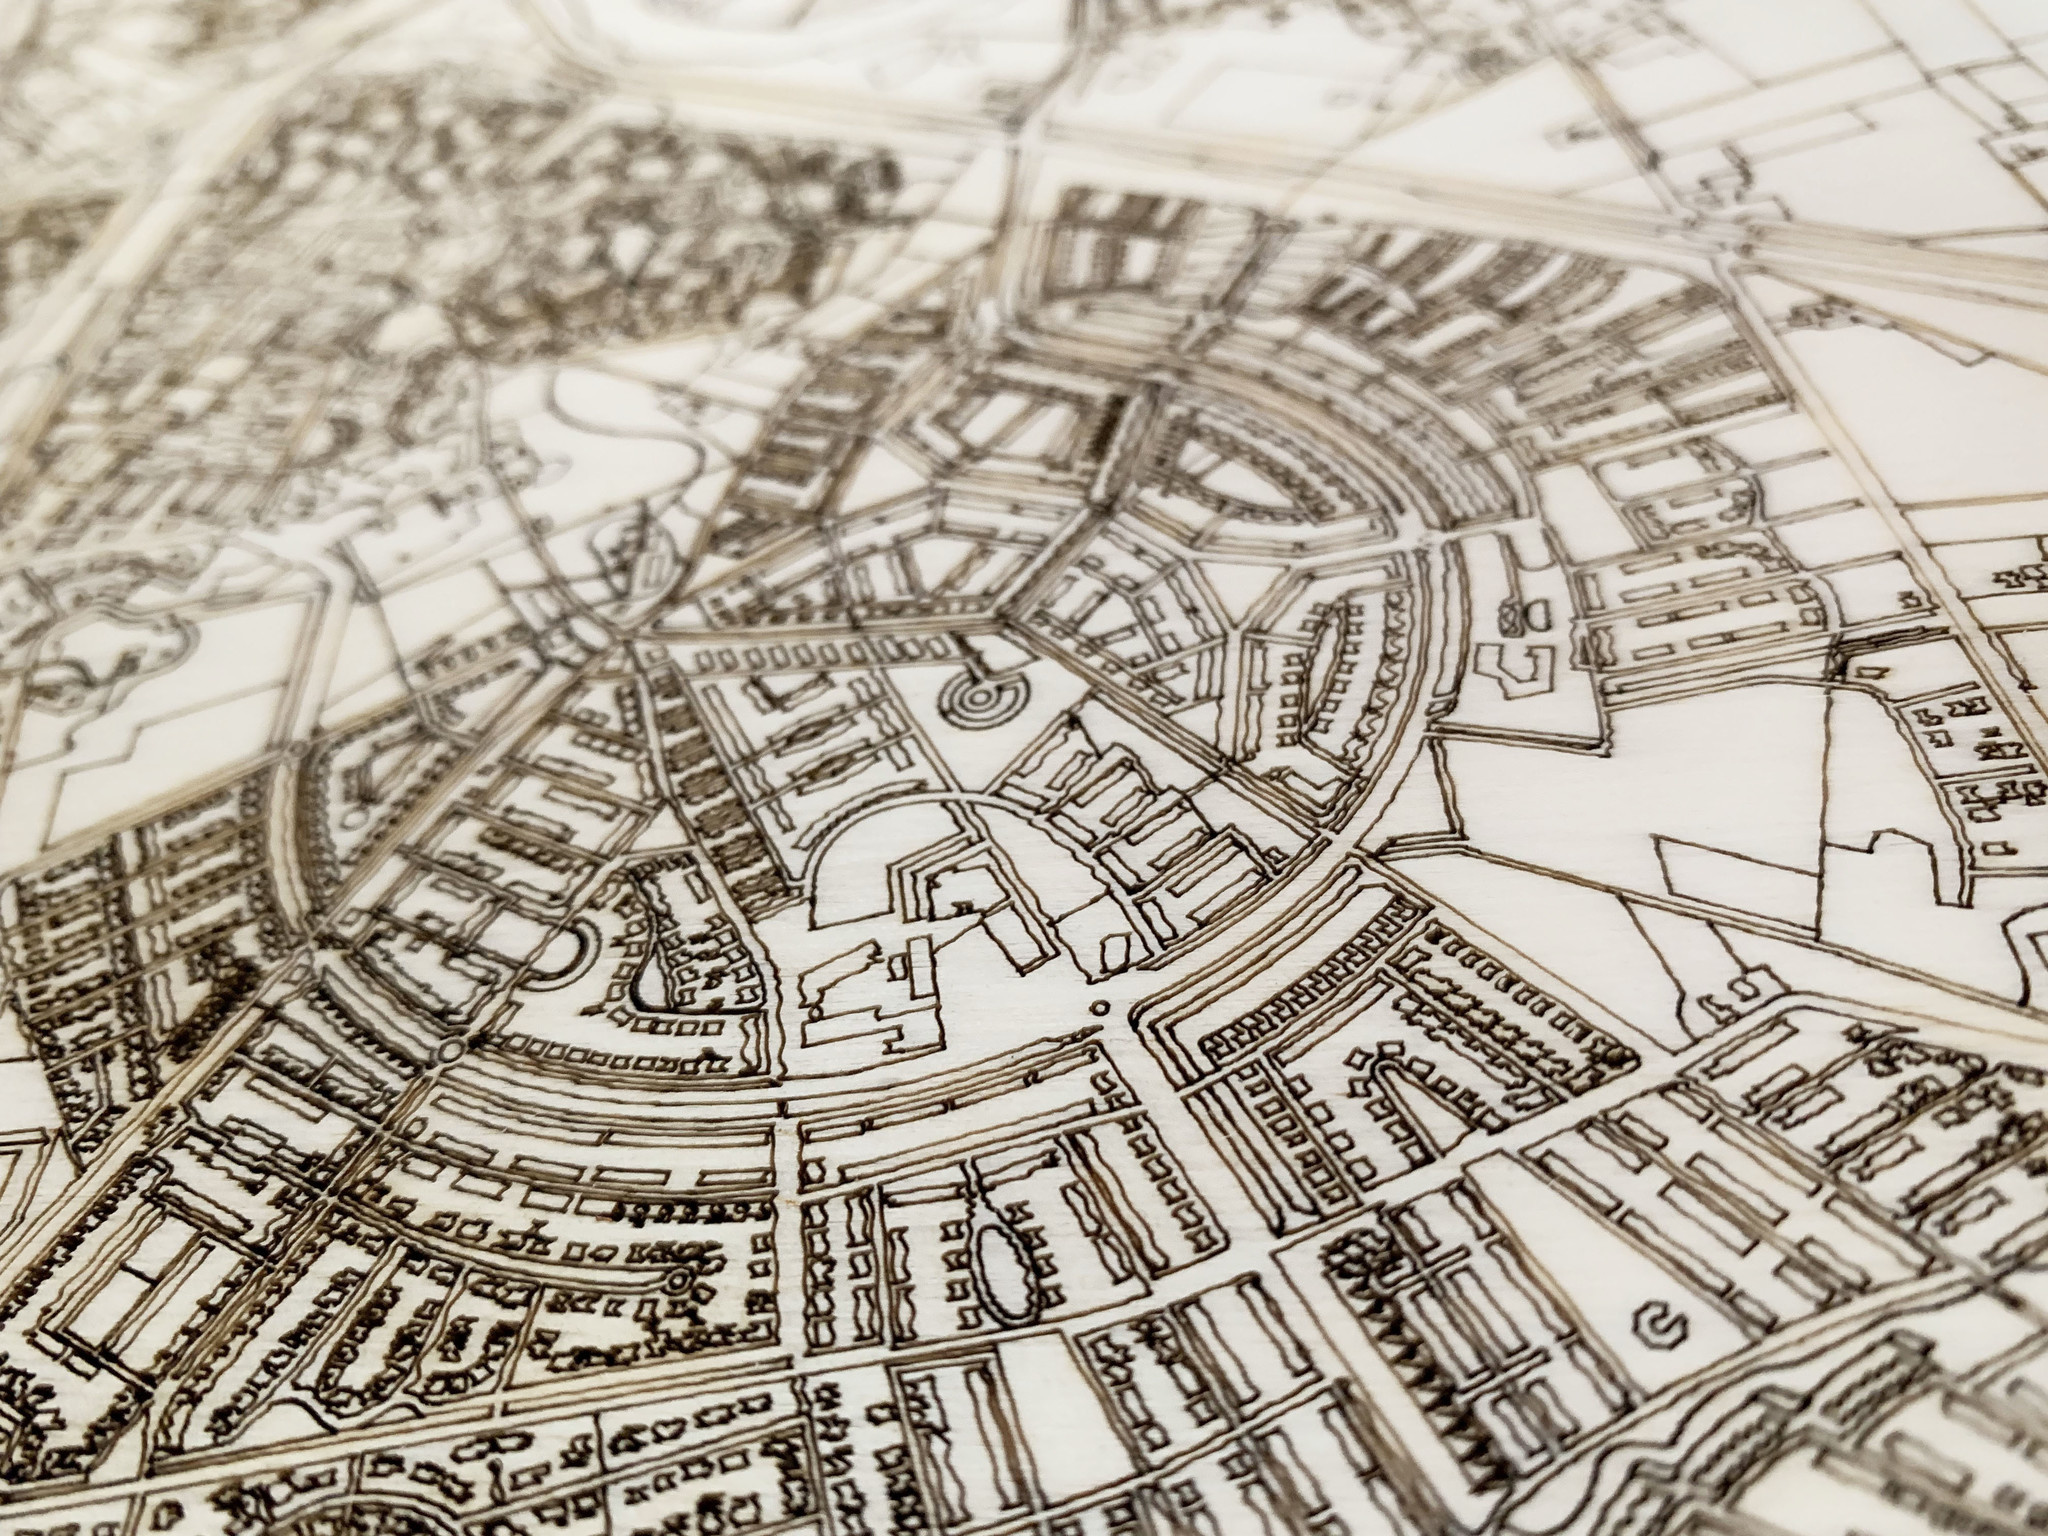 Stadtplan Karlsruhe | Wanddekoration Holz-5